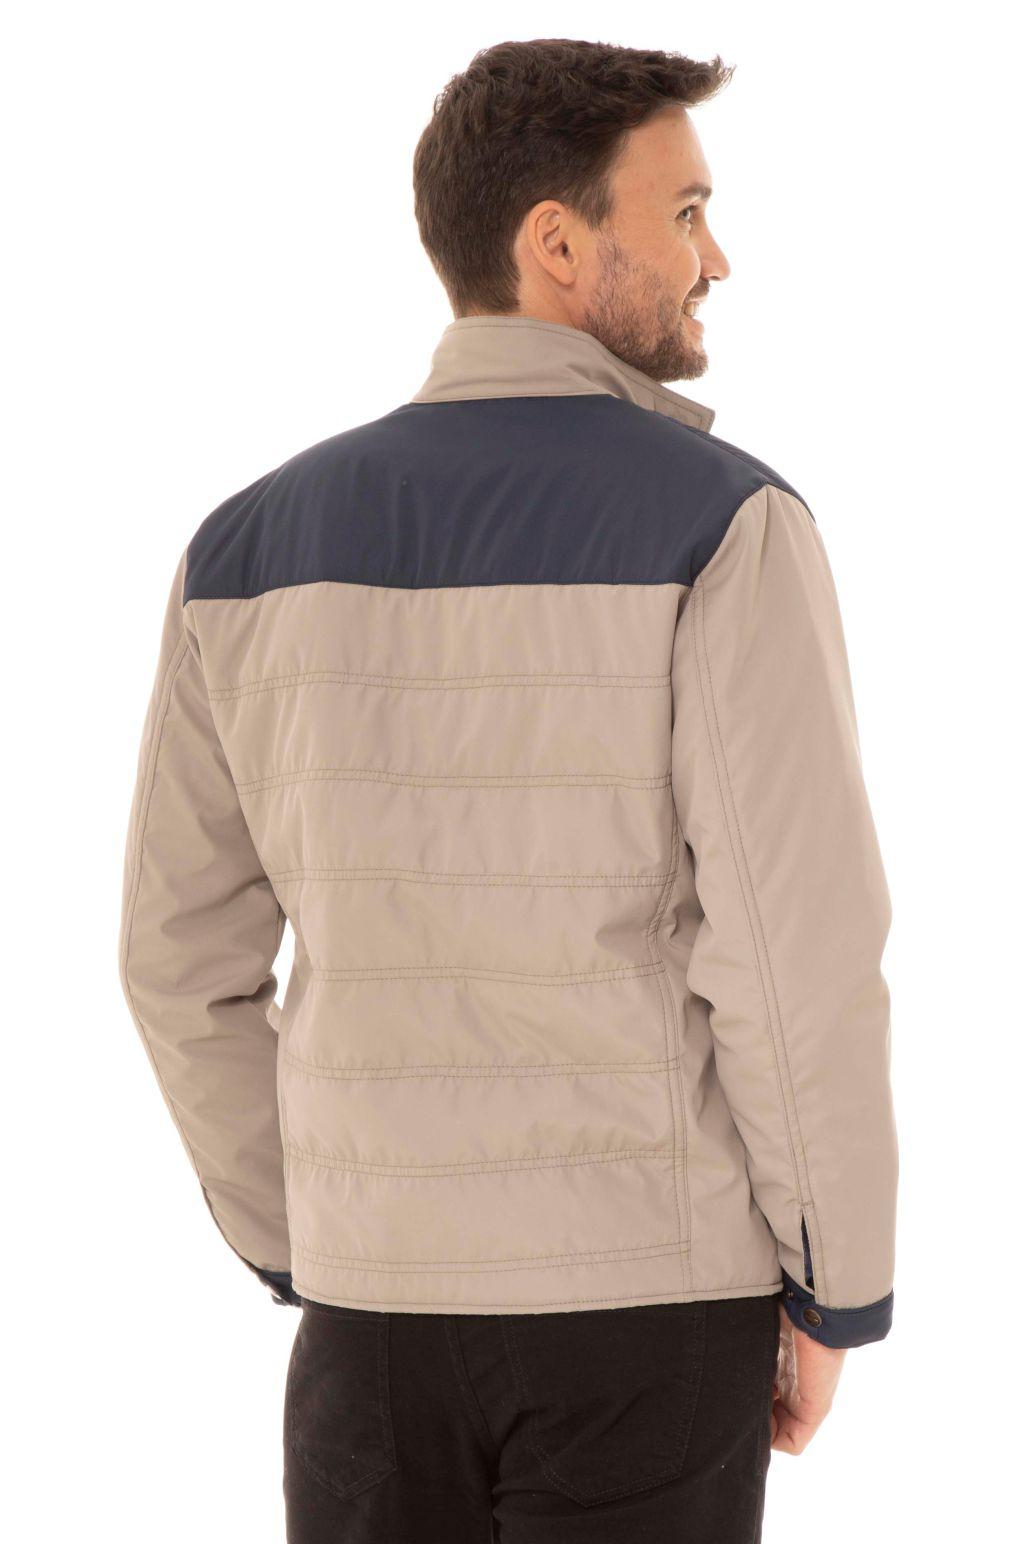 Jaqueta de Nylon Jack 2225